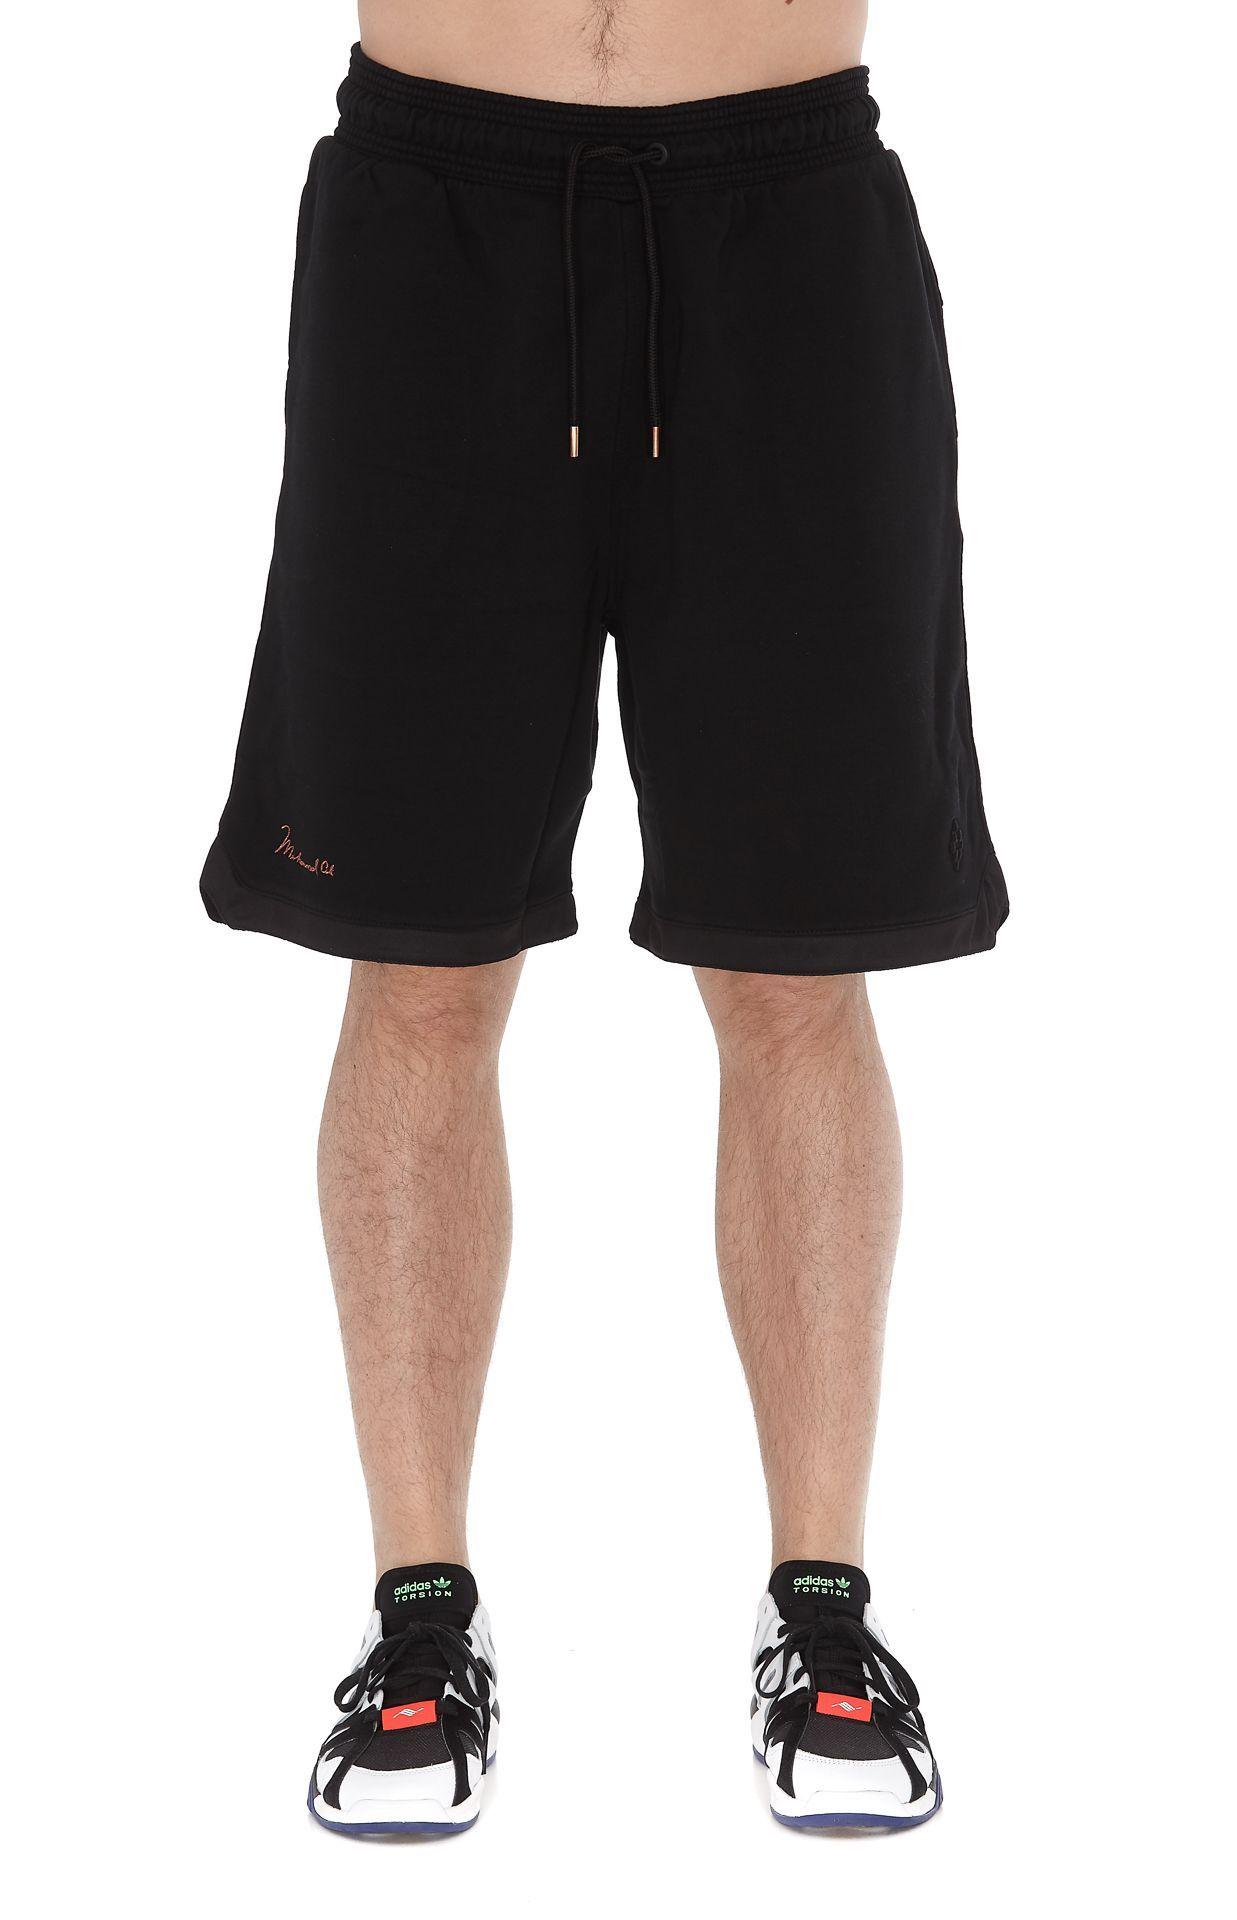 Marcelo County Burlon Milan Shorts Of Muhammad Ali bfgyIvY76m